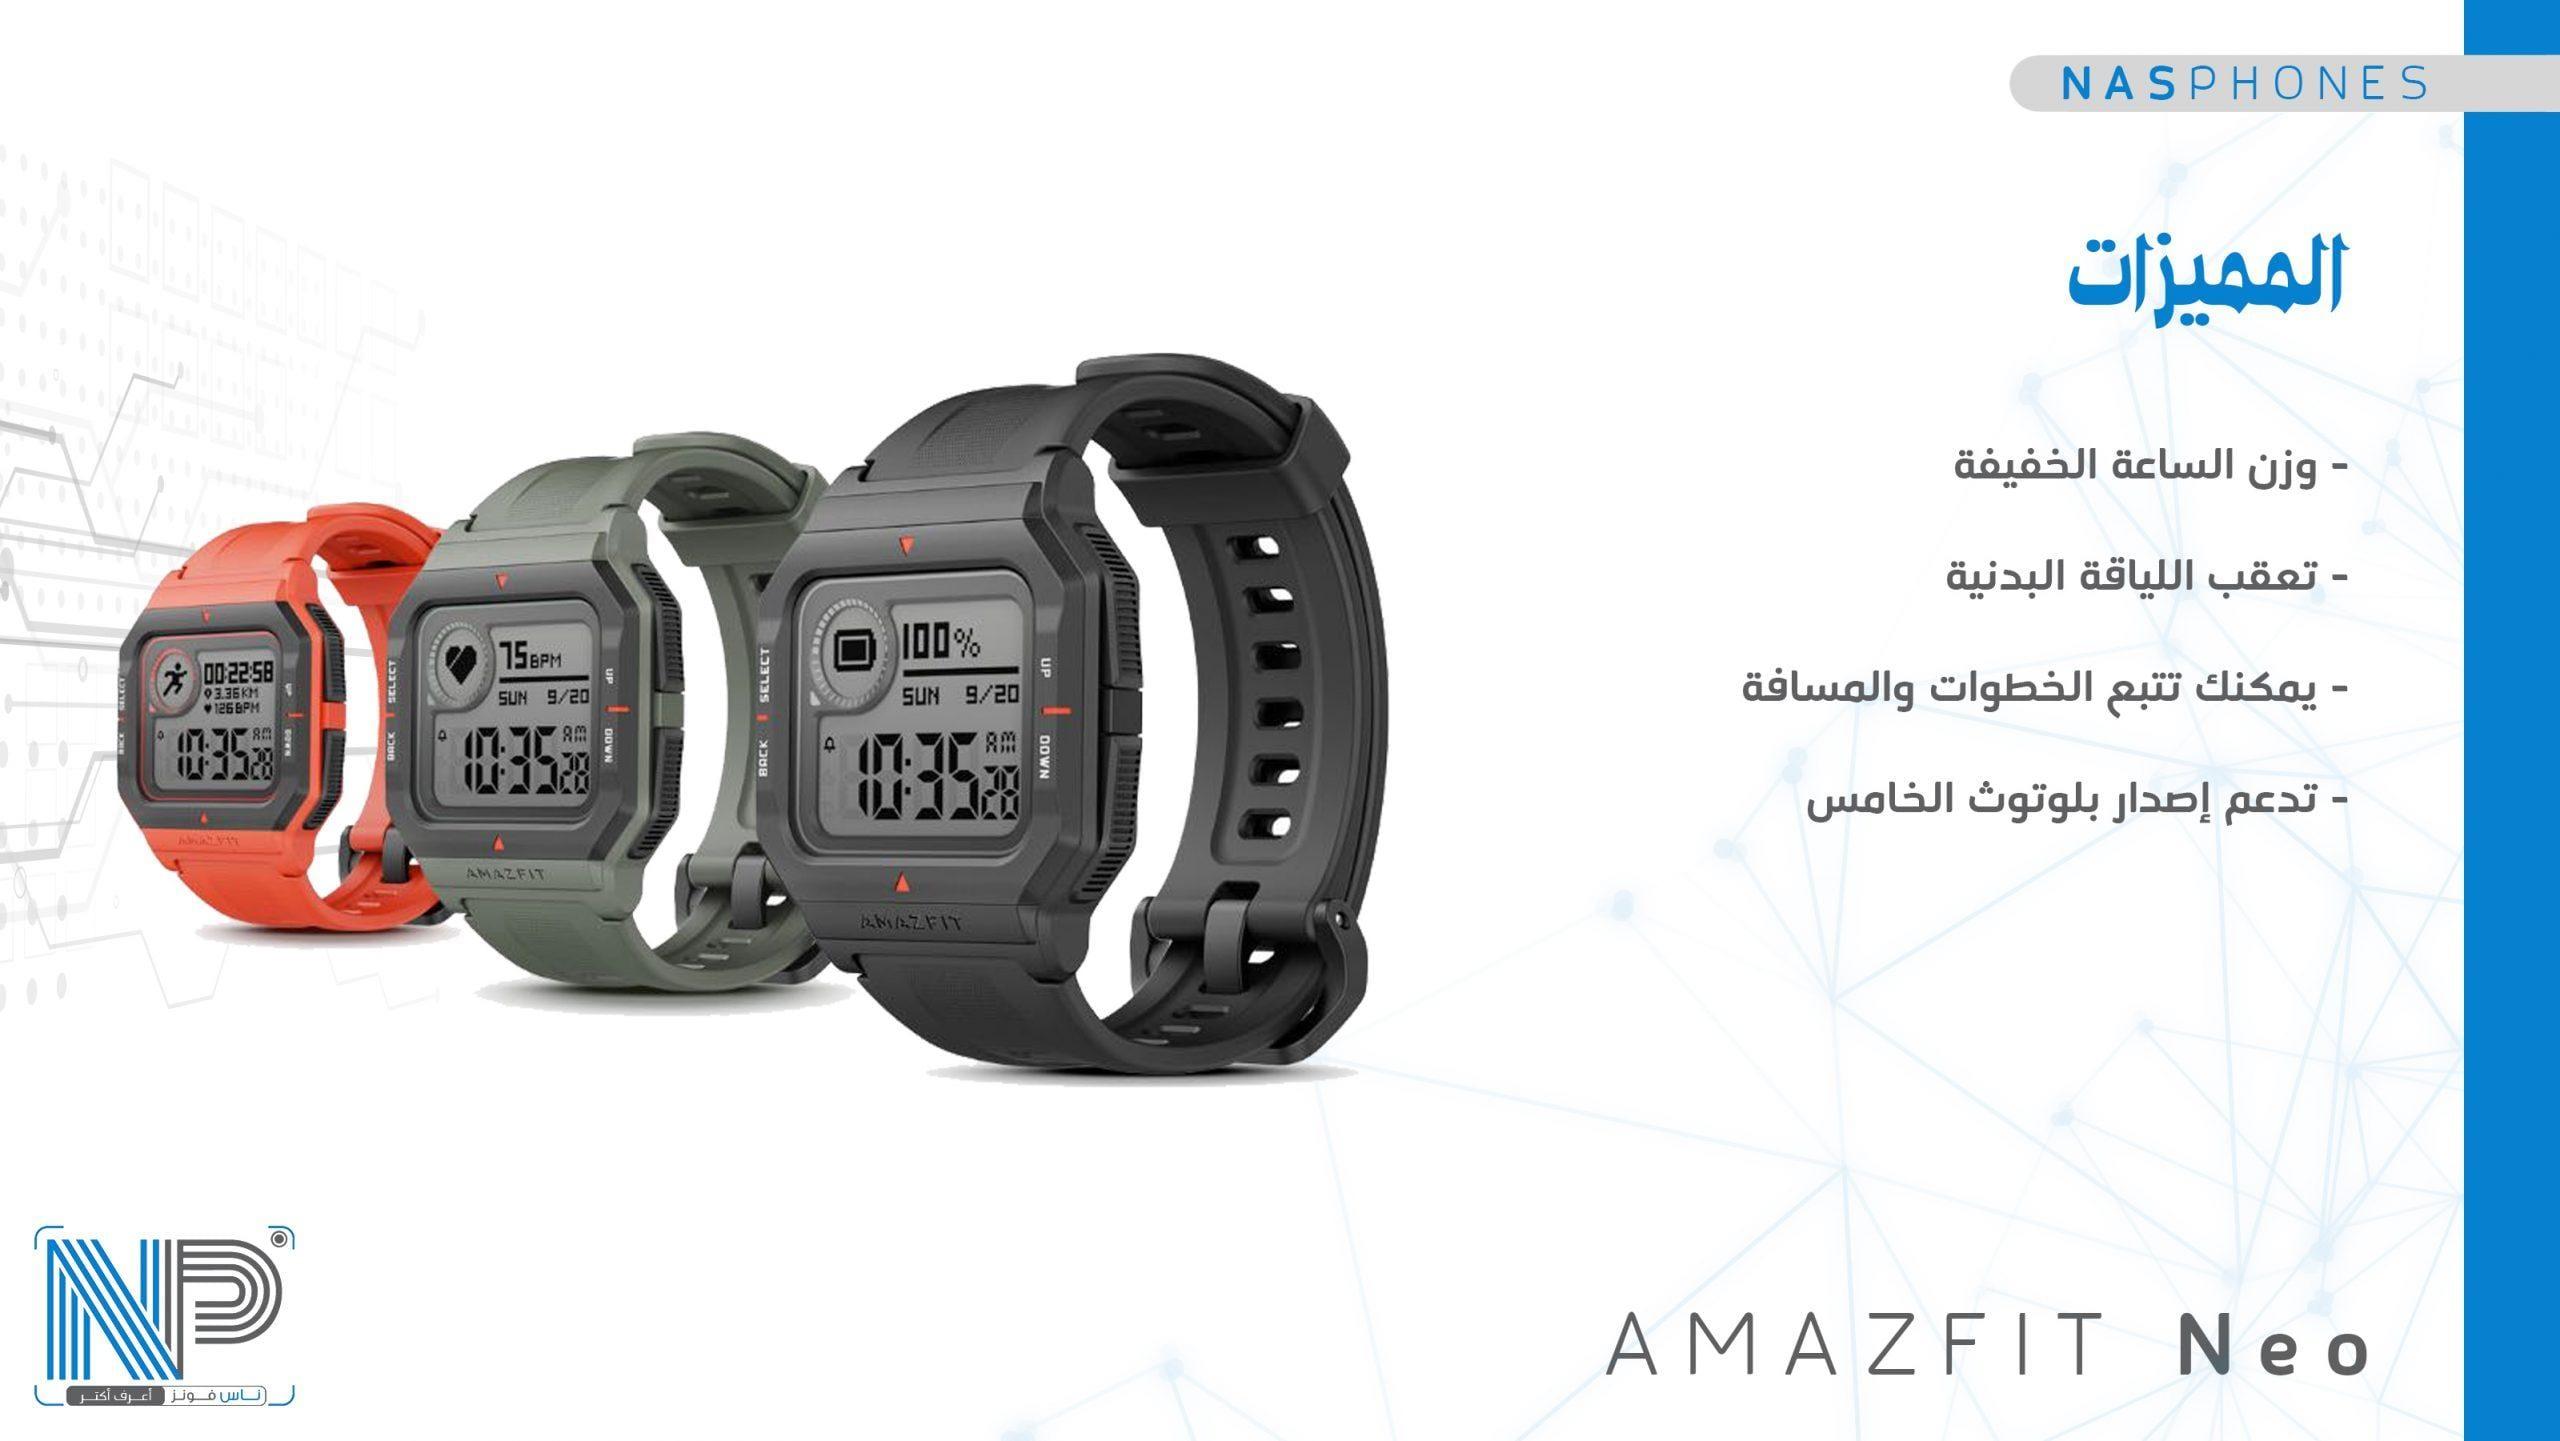 مميزات ساعة Amazfit Neo